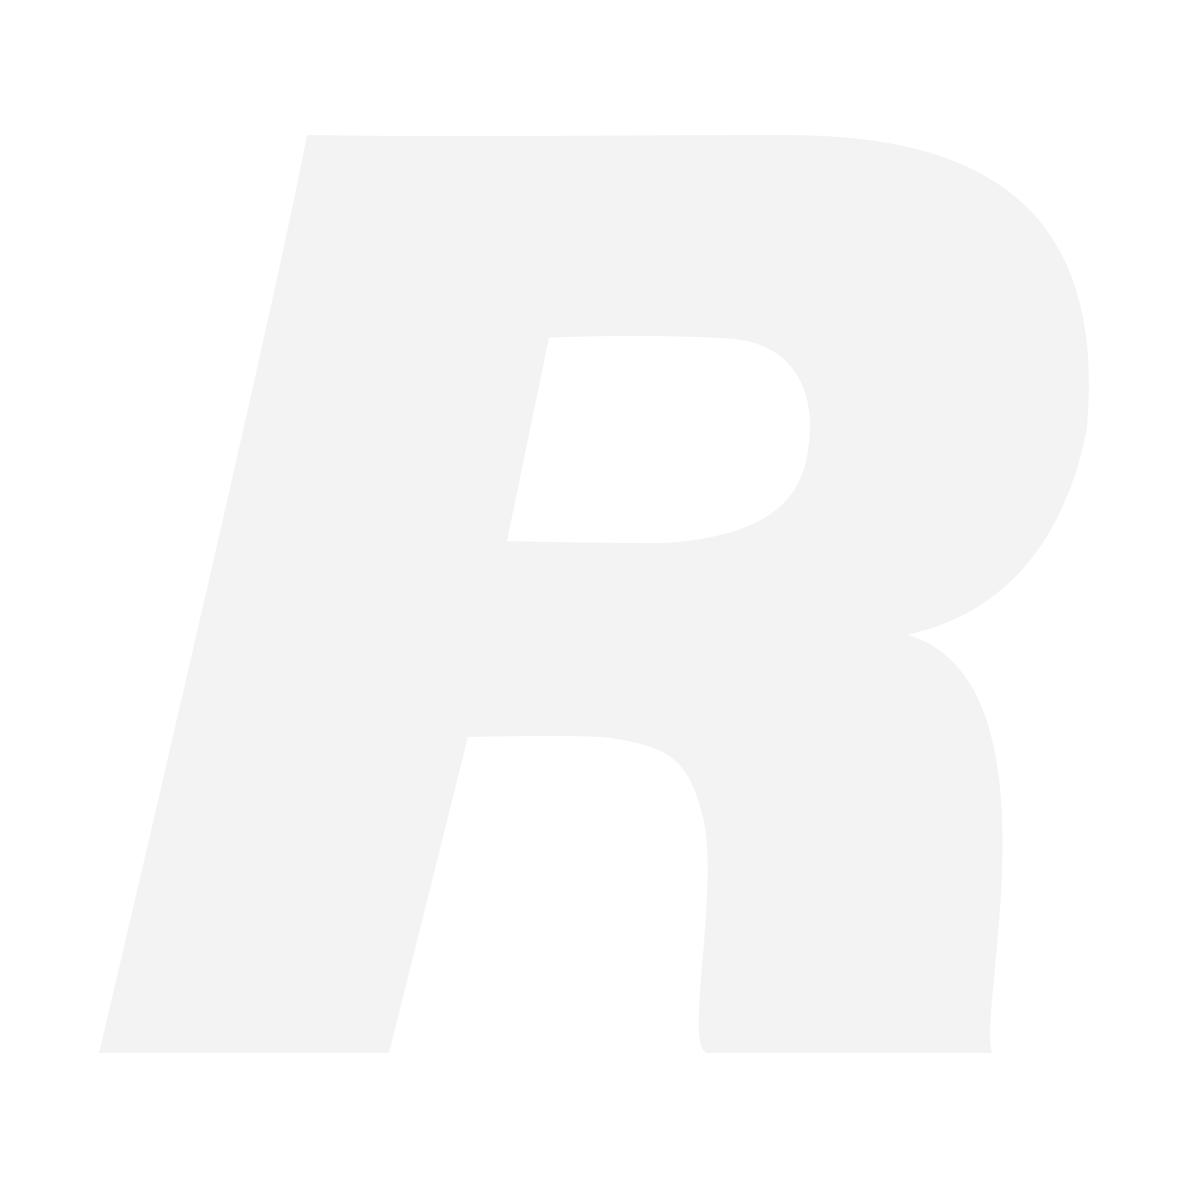 26151 ELINCHROM Ranger Quadra Softbox 40 x 40 cm